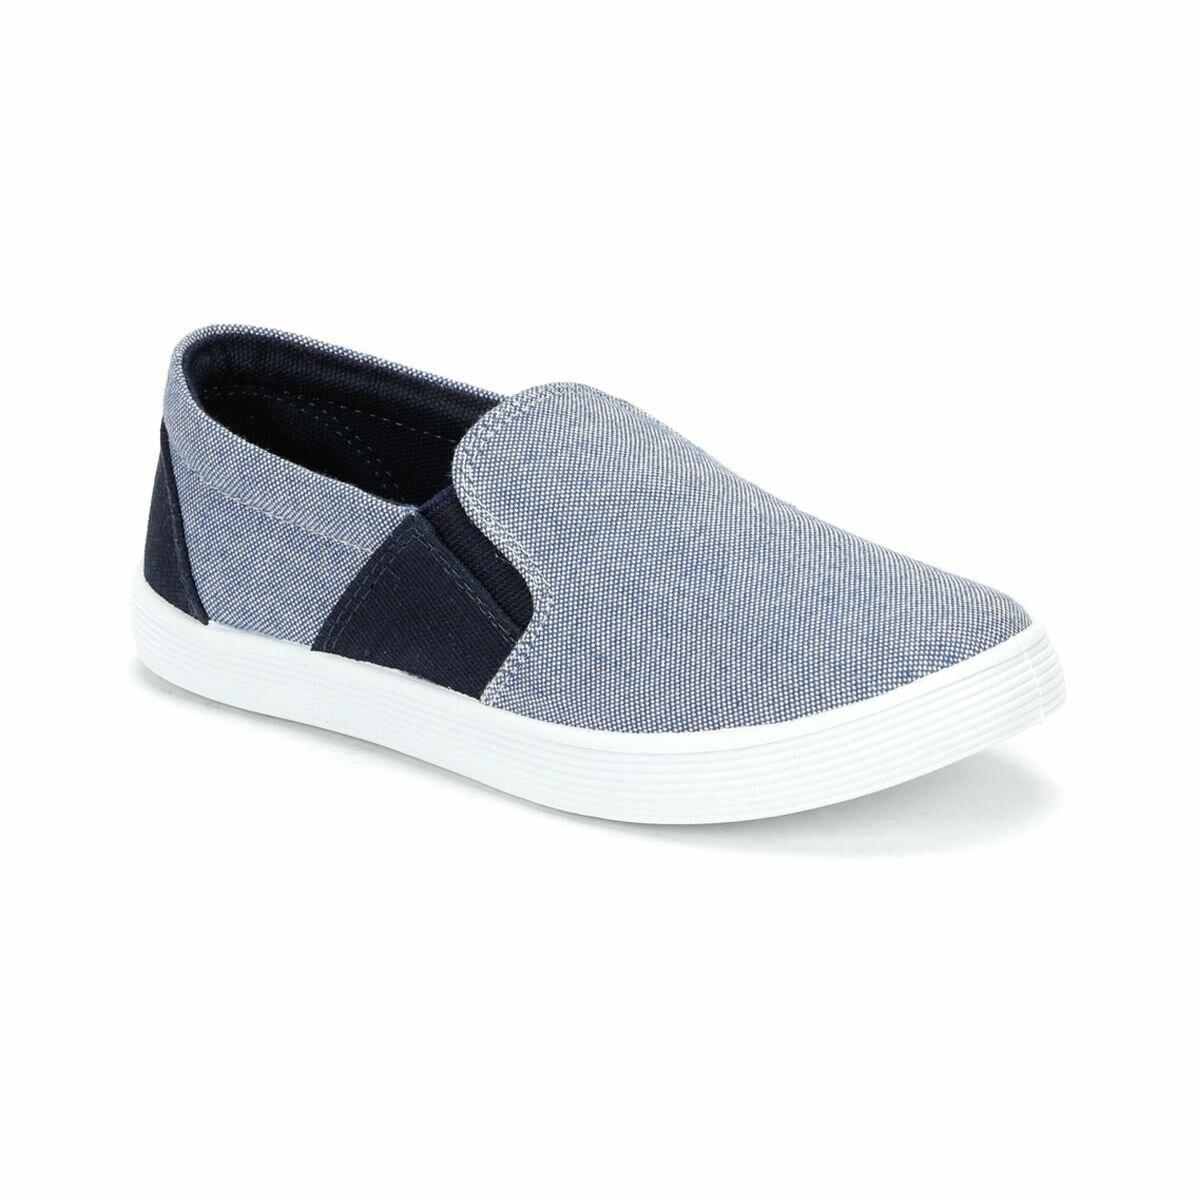 FLO 81.508268.F Blue Male Child Slip On Shoes Polaris